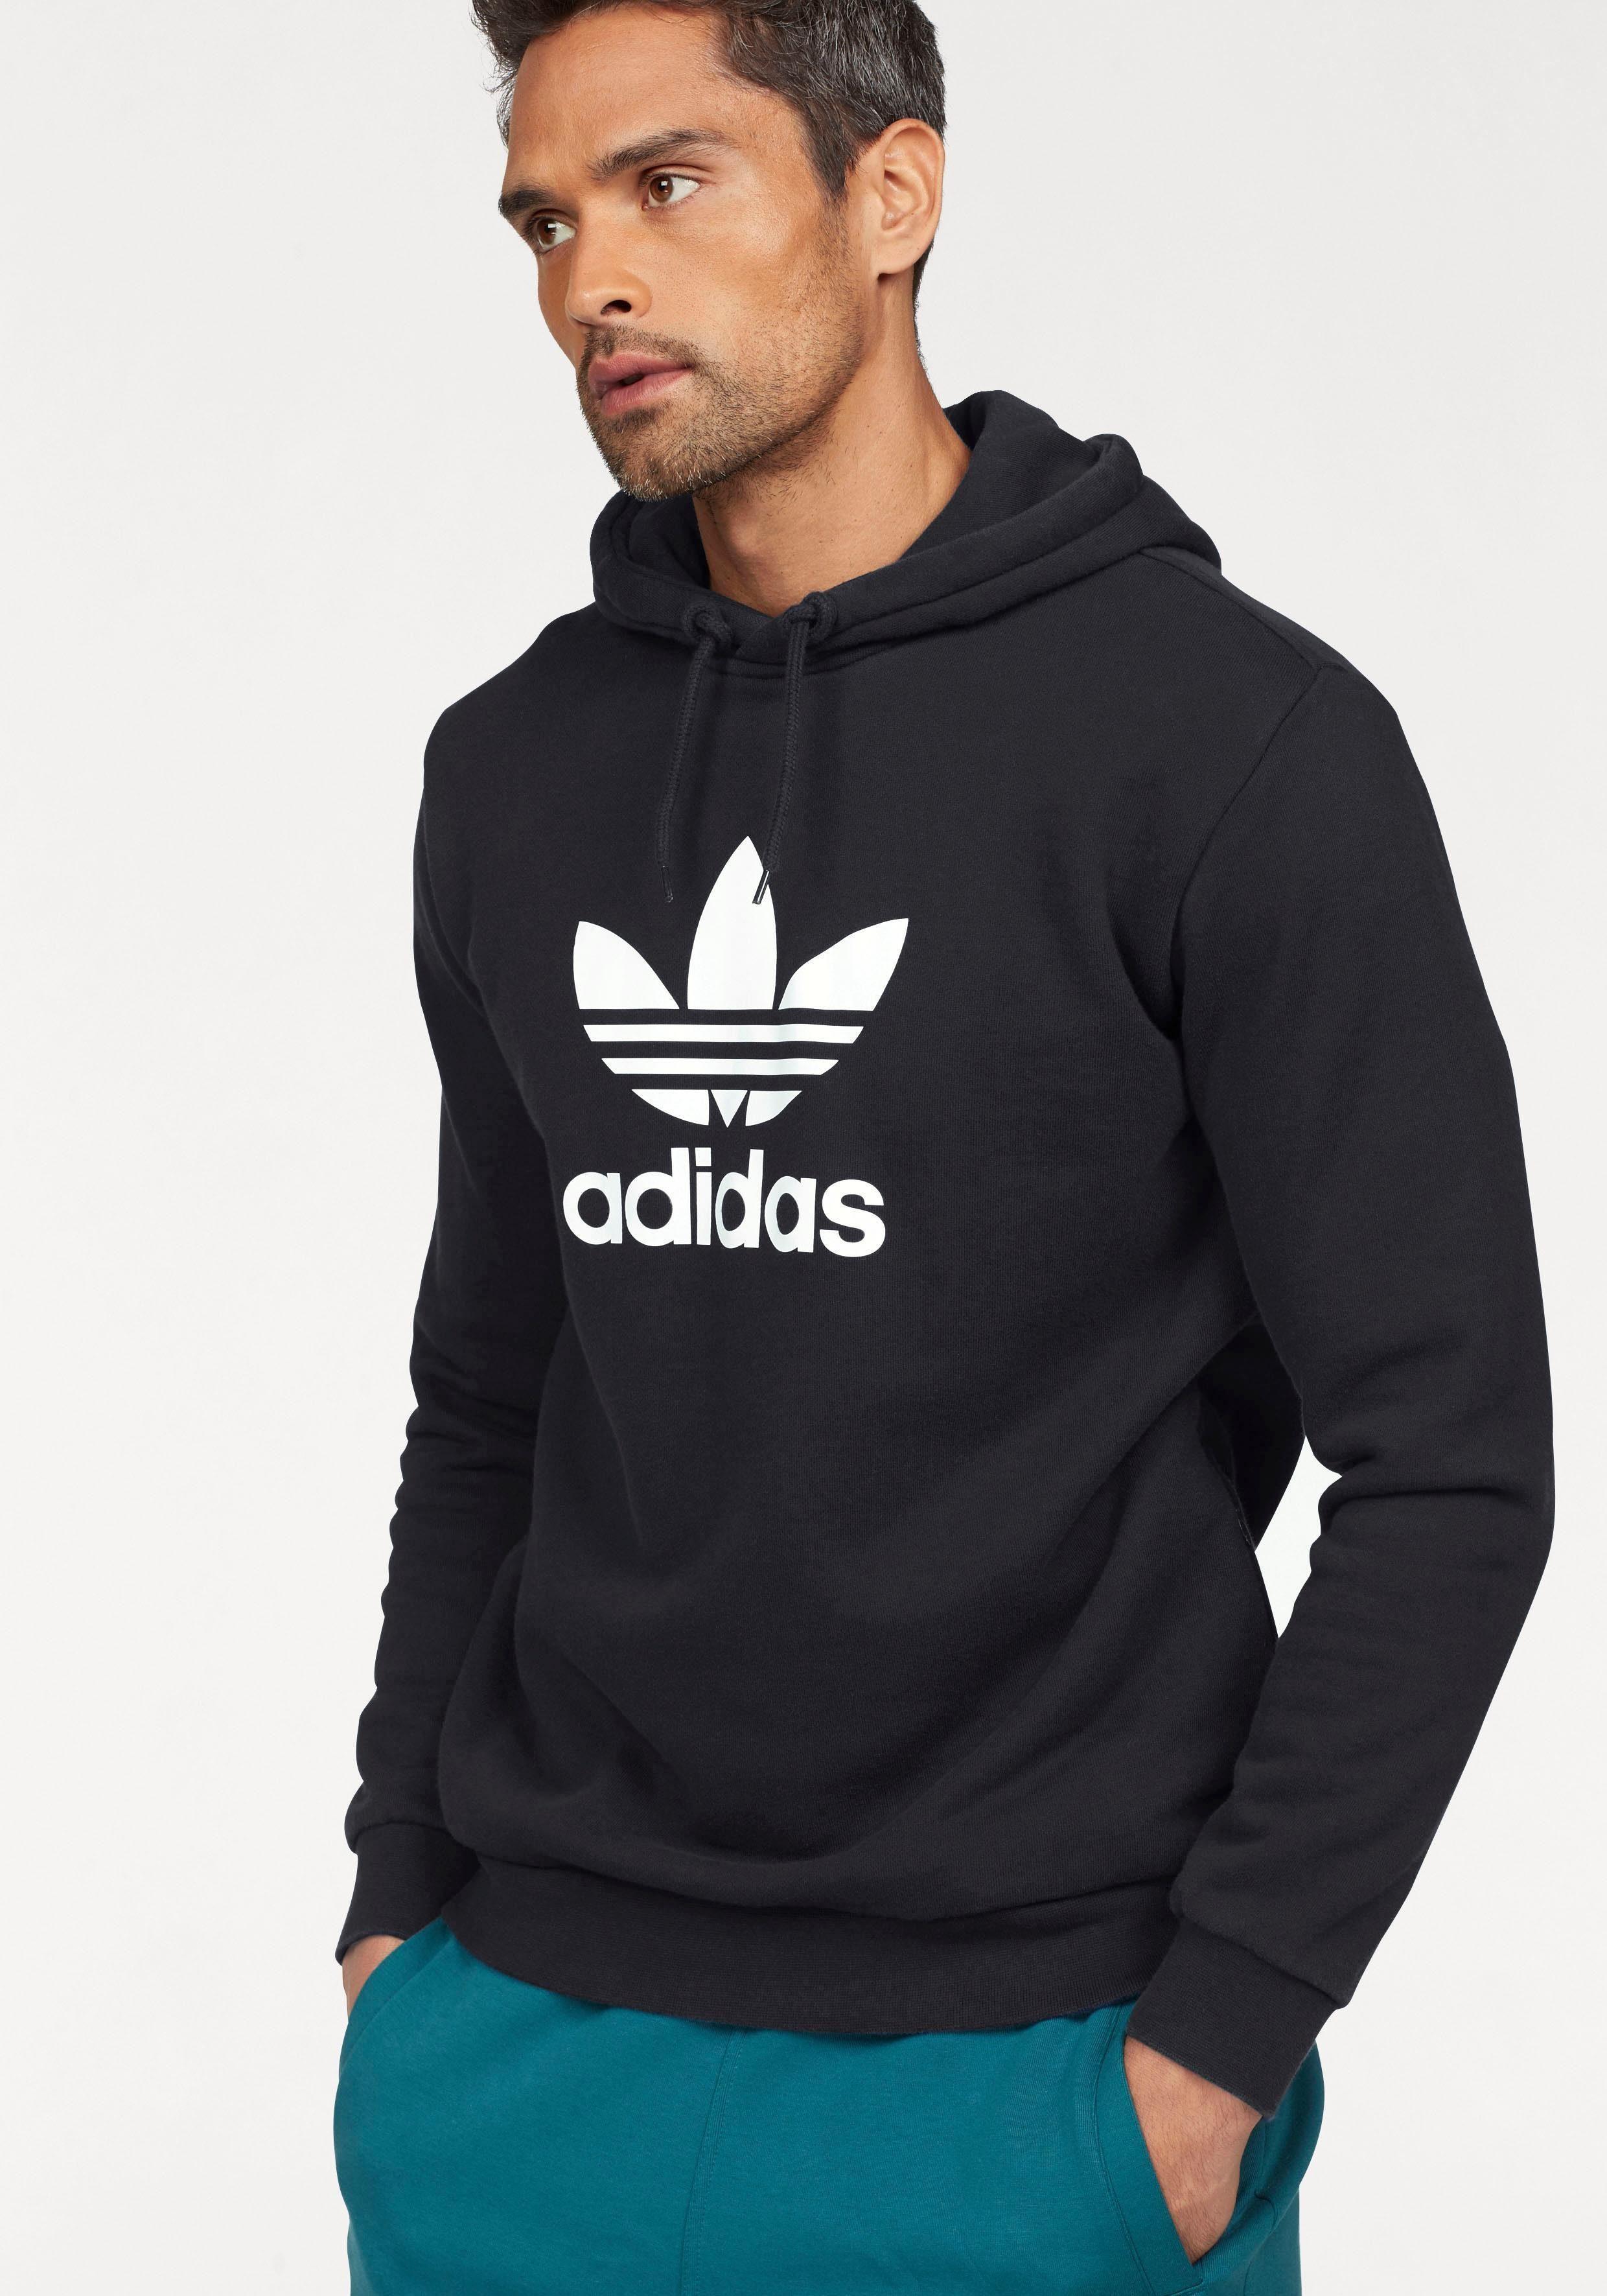 ADIDAS ORIGINAL TREFOIL Sweatshirt Hoodie Pullover Svchwarz